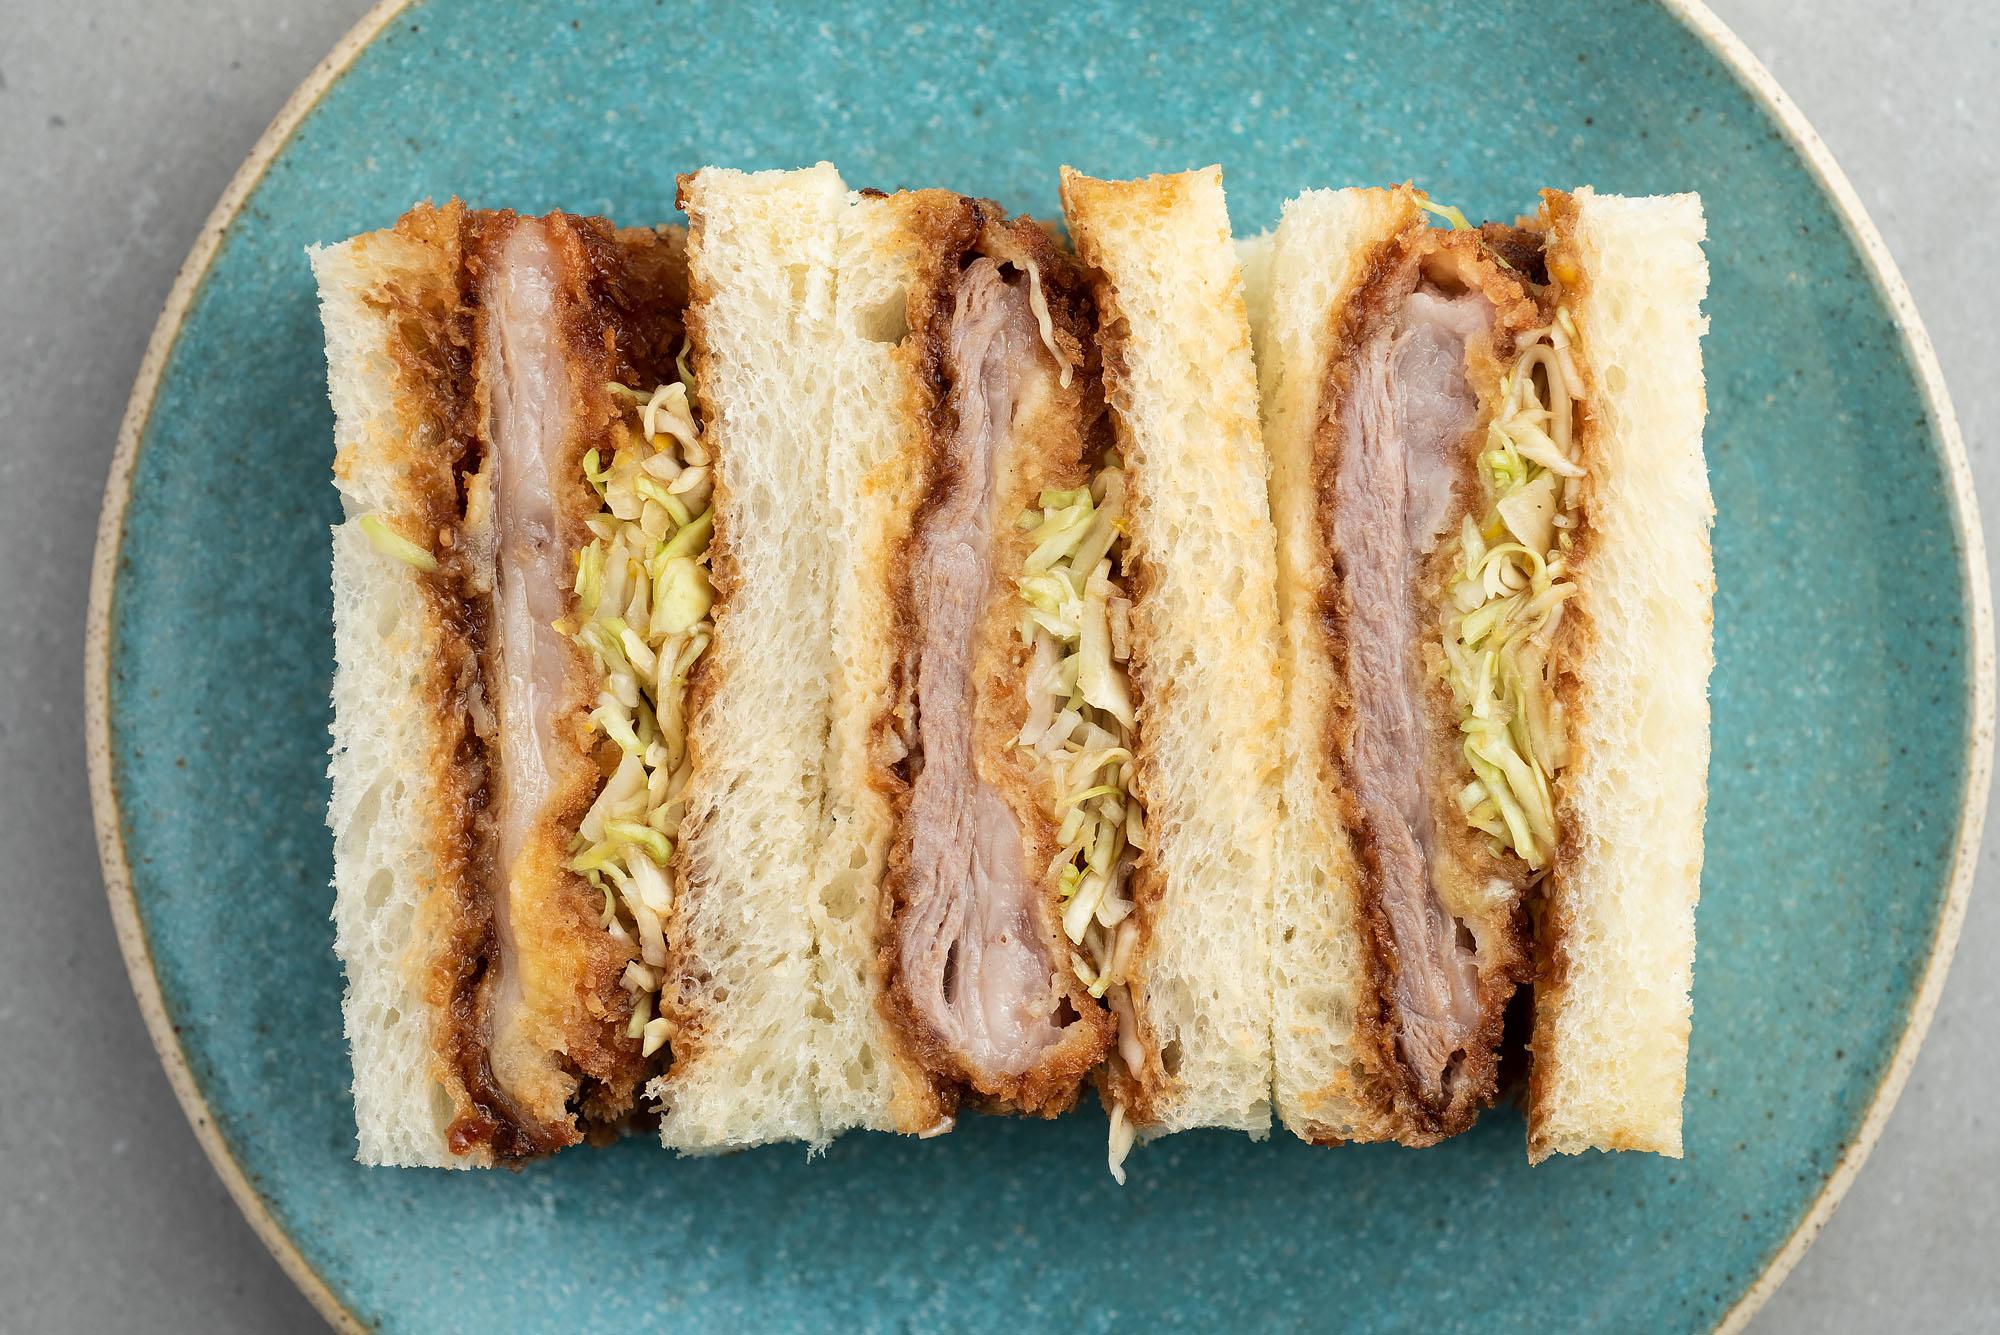 LA's Hugely Popular Katsu Sandwich Shop Konbi Heads to NYC for a Night